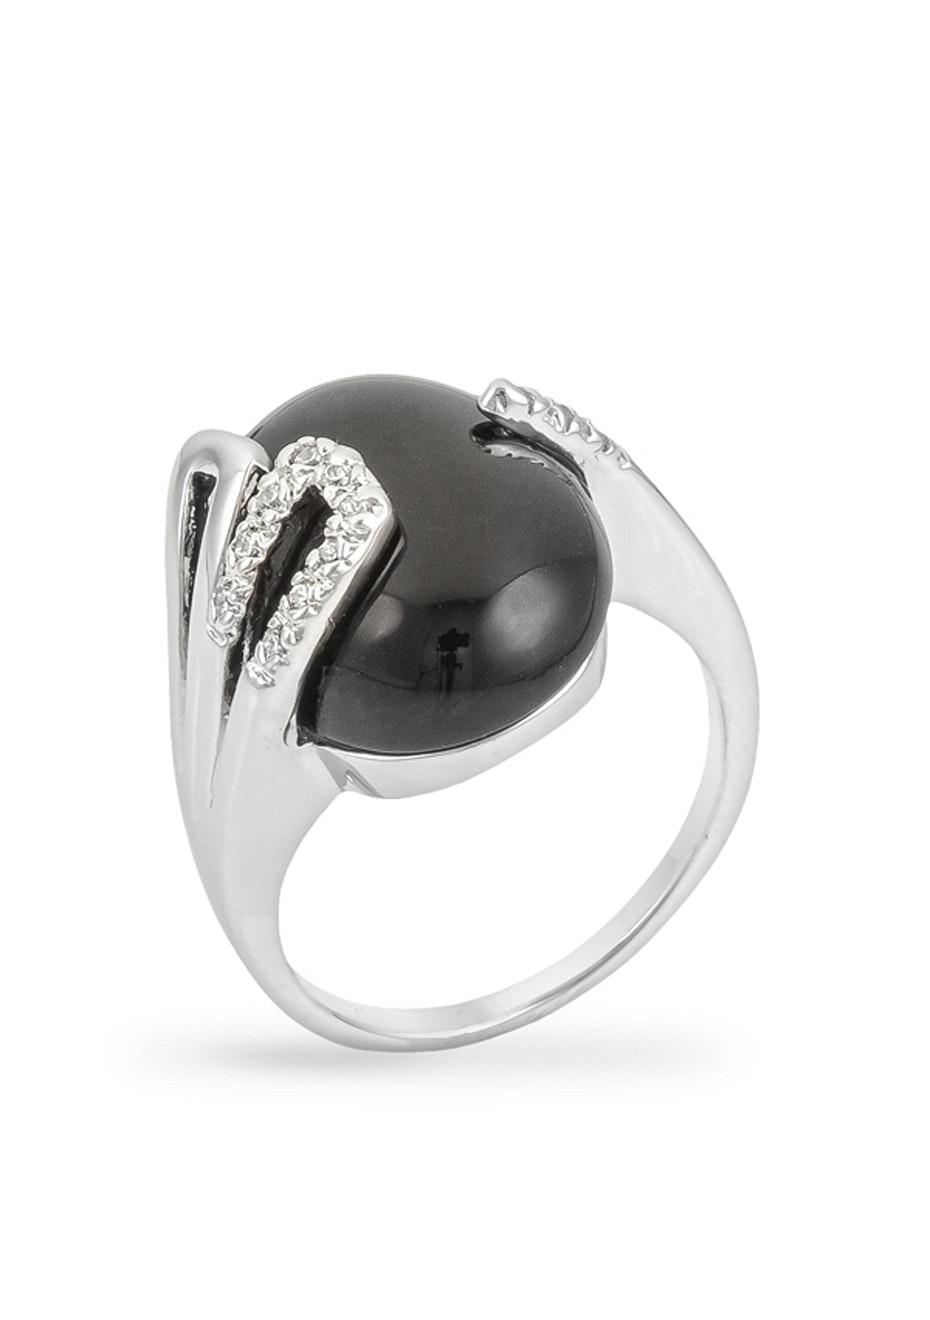 Black Onyx ring w White Gold